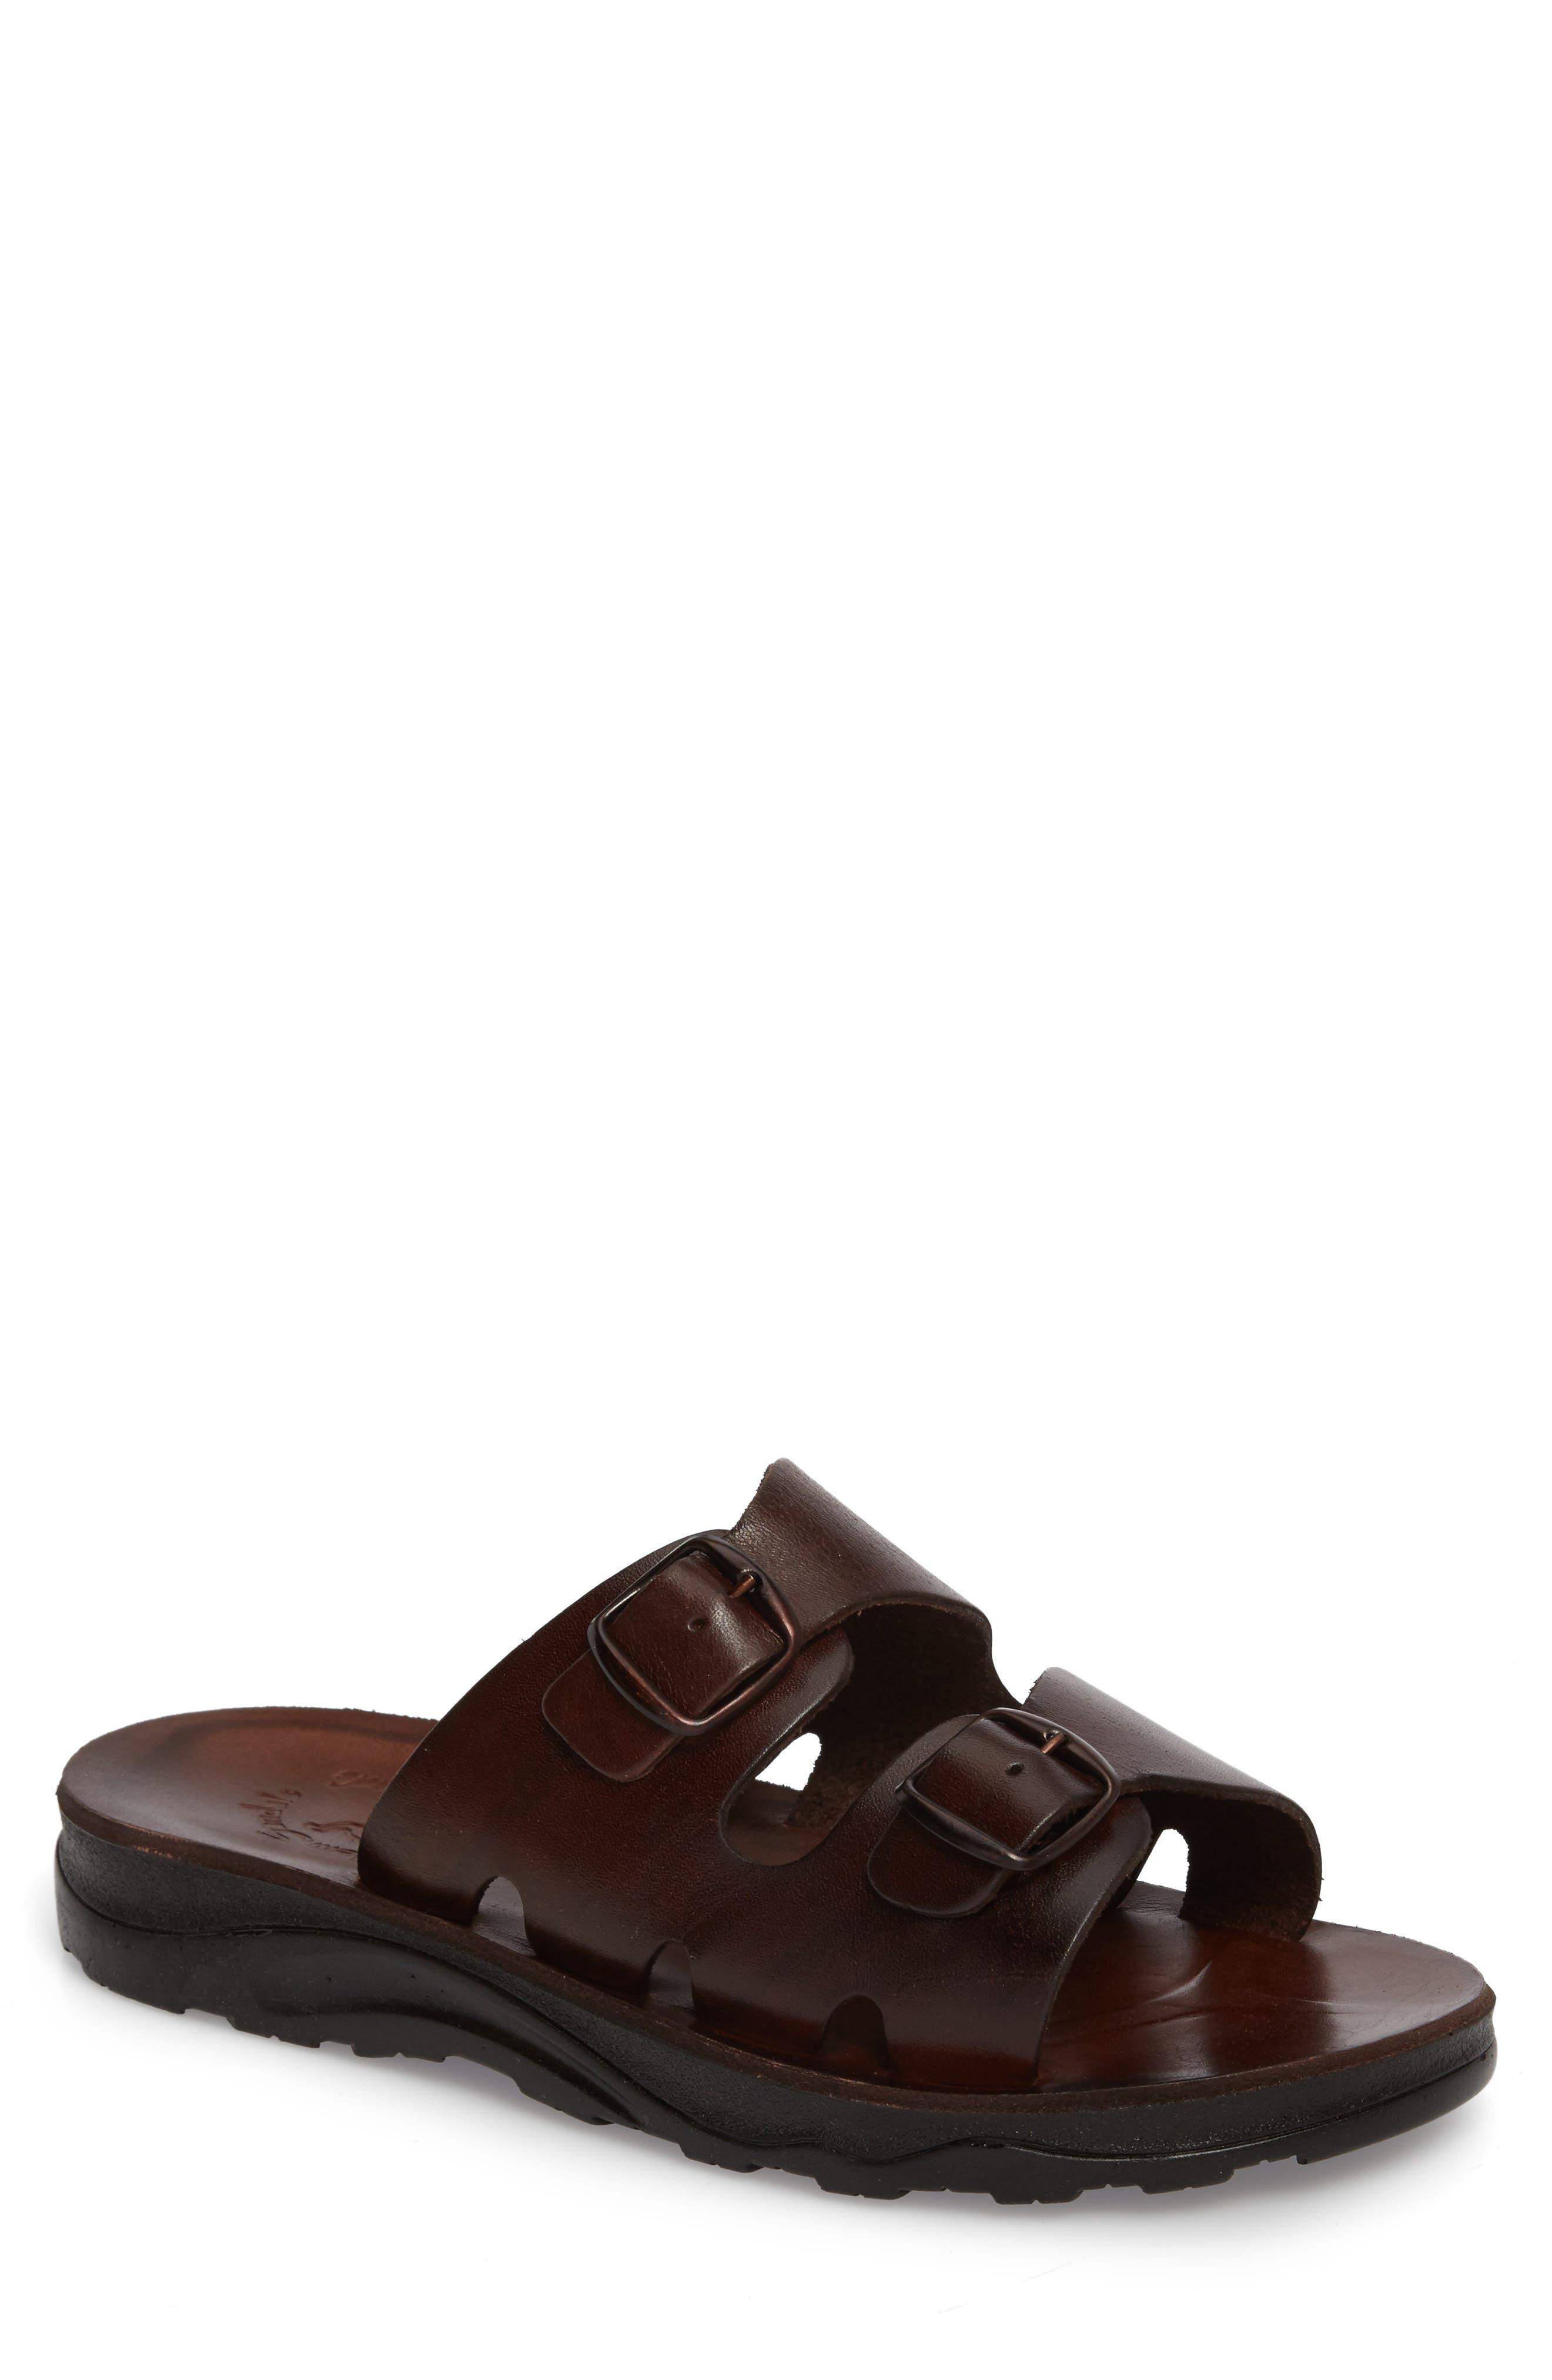 Barnabas Sandal,                         Main,                         color, Brown Leather